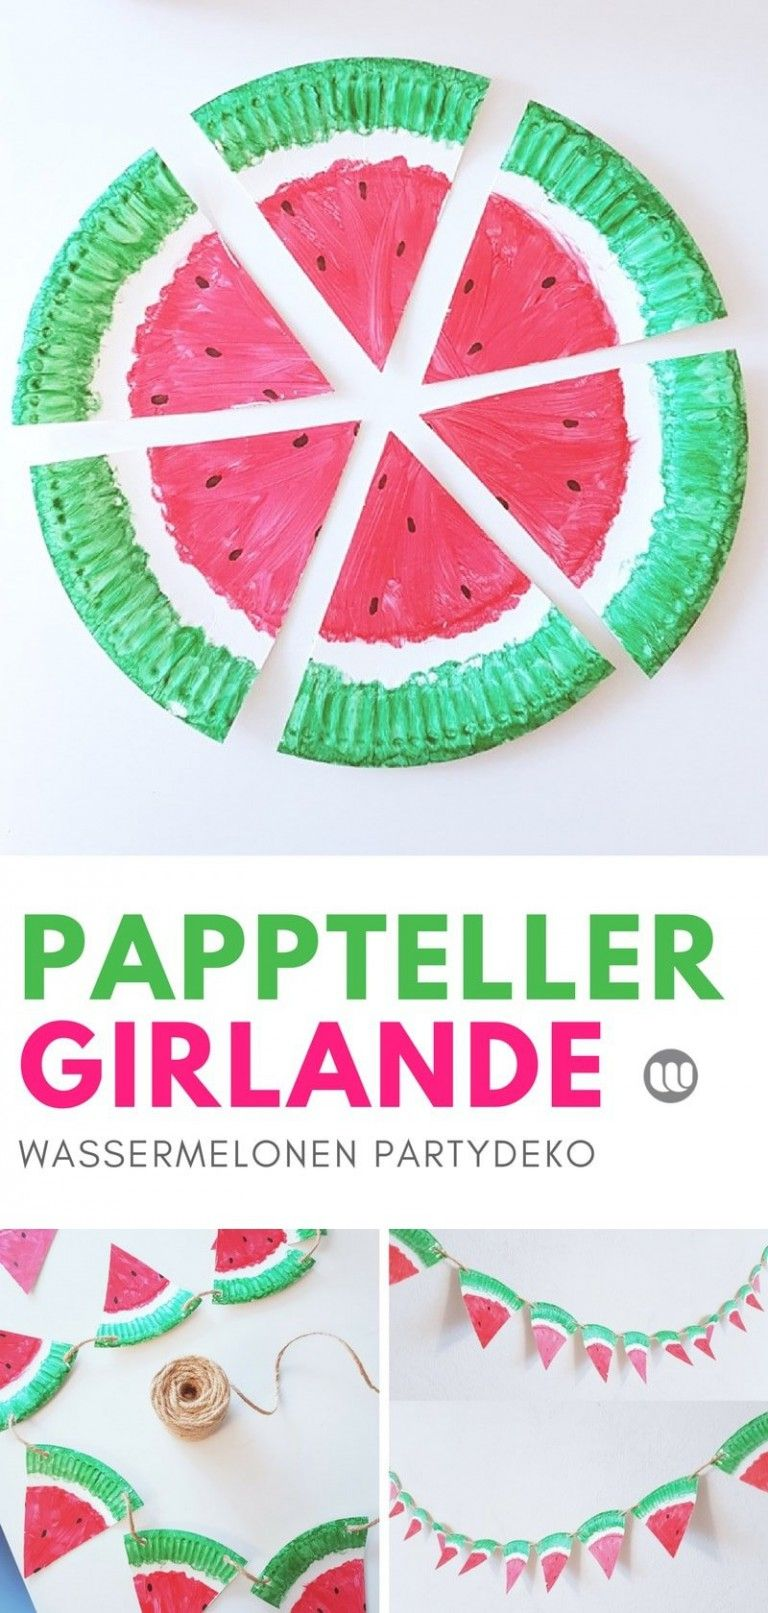 Photo of Papirplate håndverksidé om sommeren: Fruktig melongirland